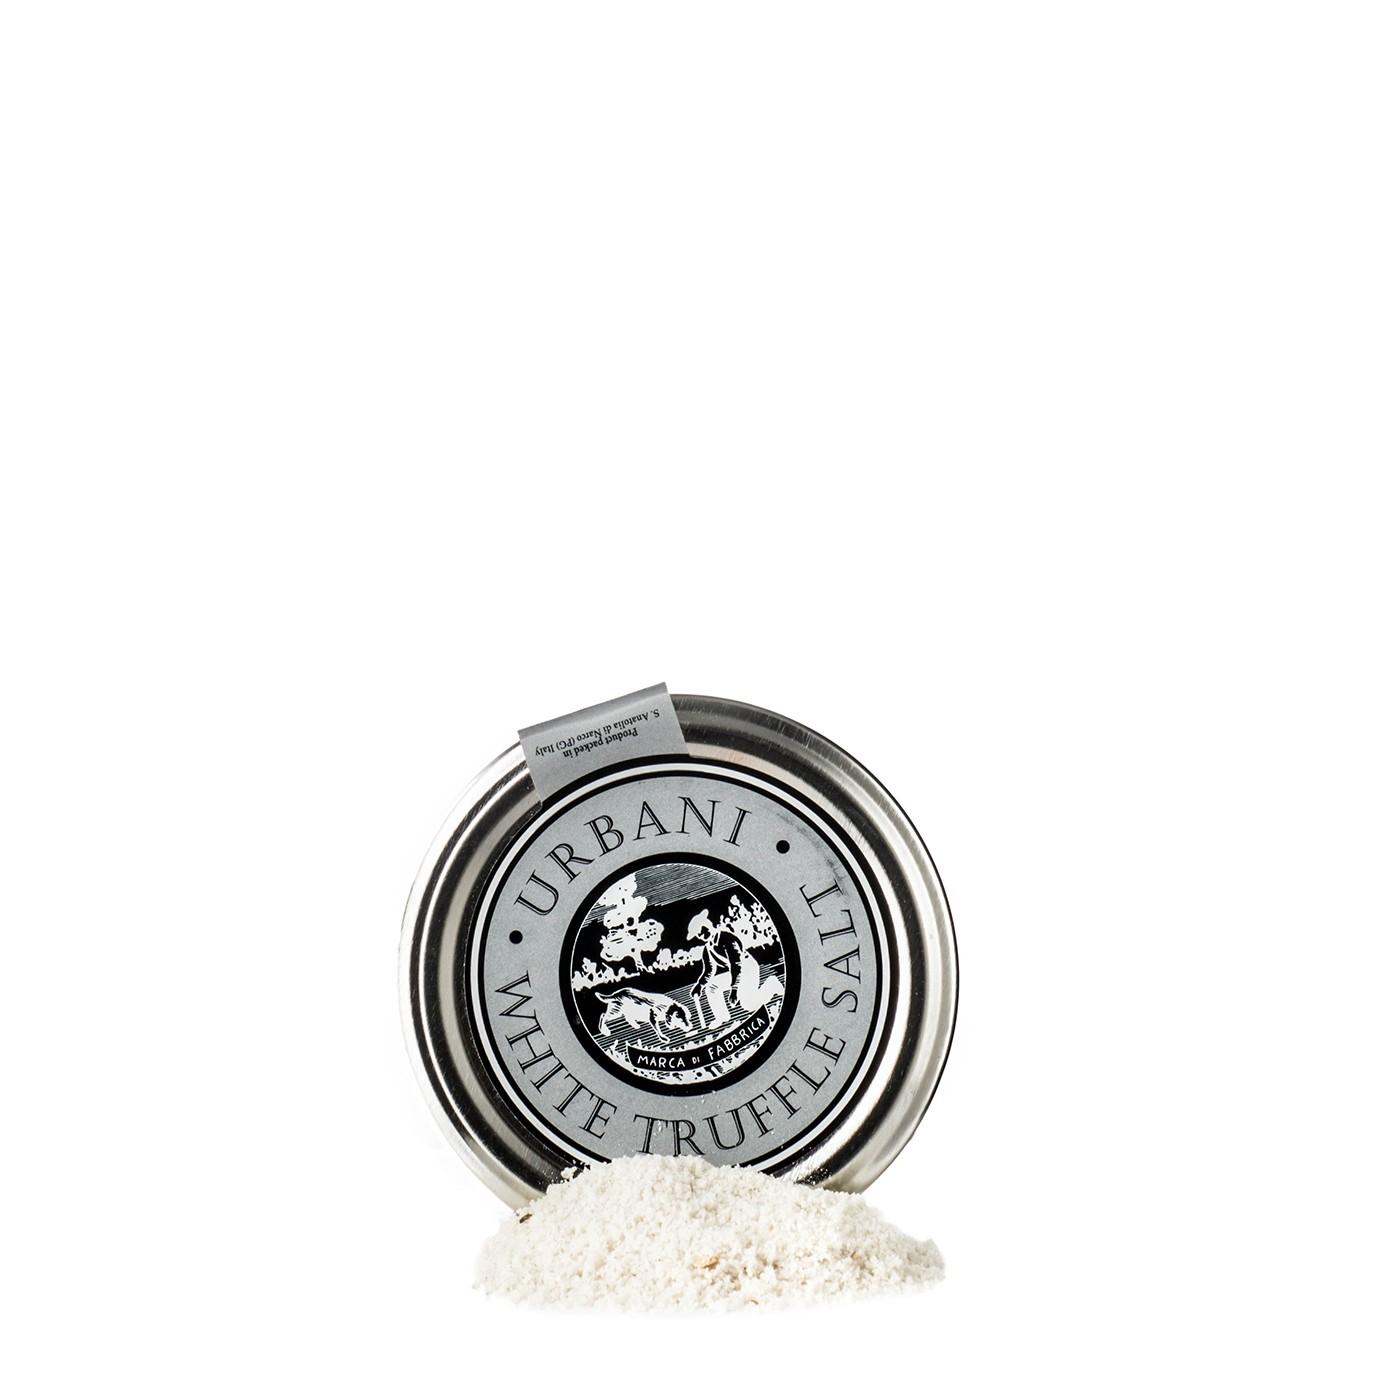 White Truffle Salt 3.5 oz